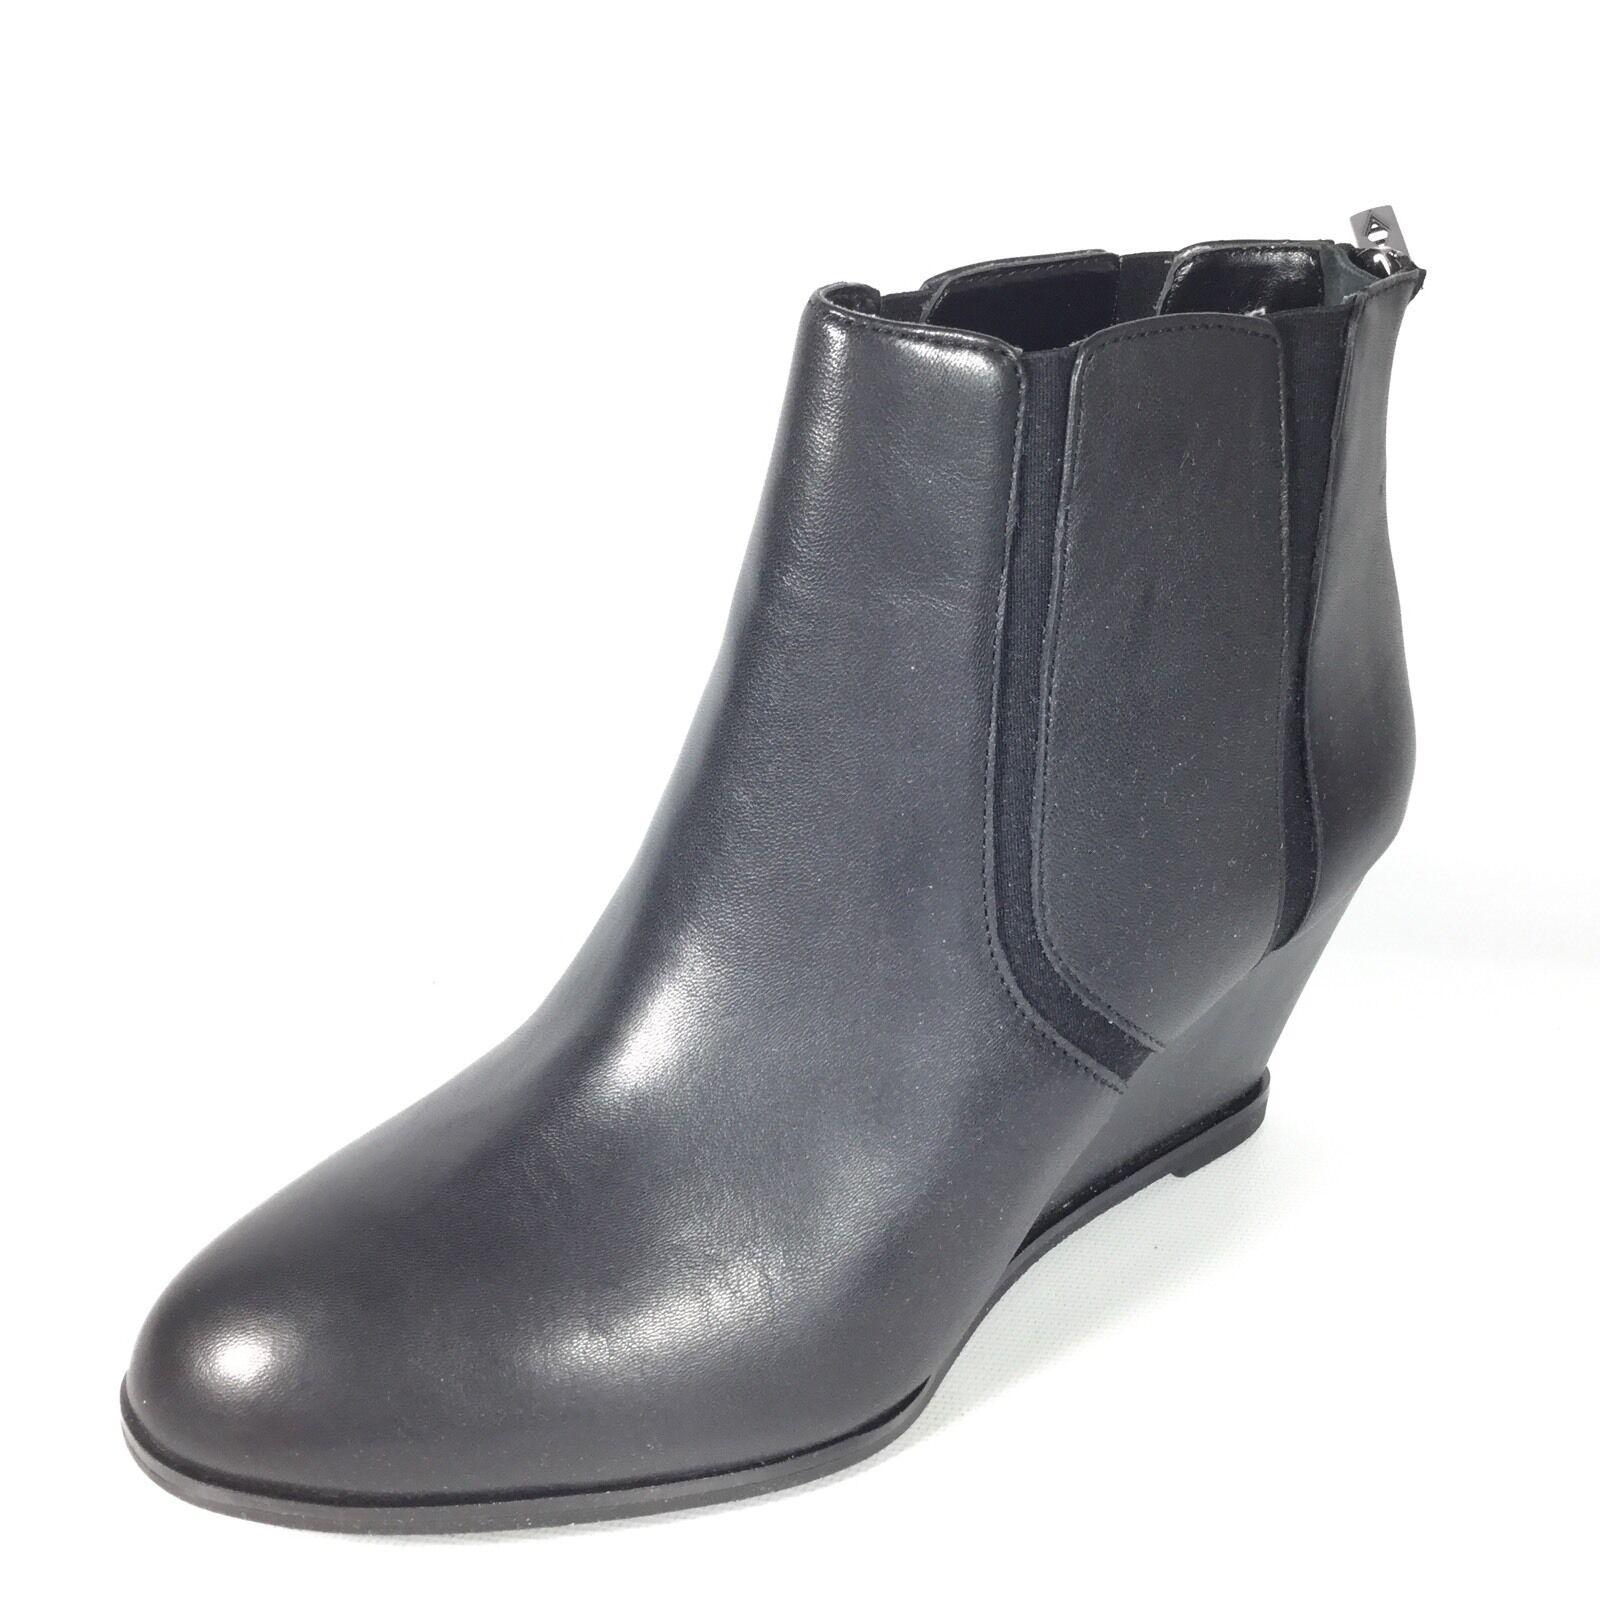 Alfani Step N Flex Calistah Women's Size 8 M Black Leather Wedge Ankle Boots.